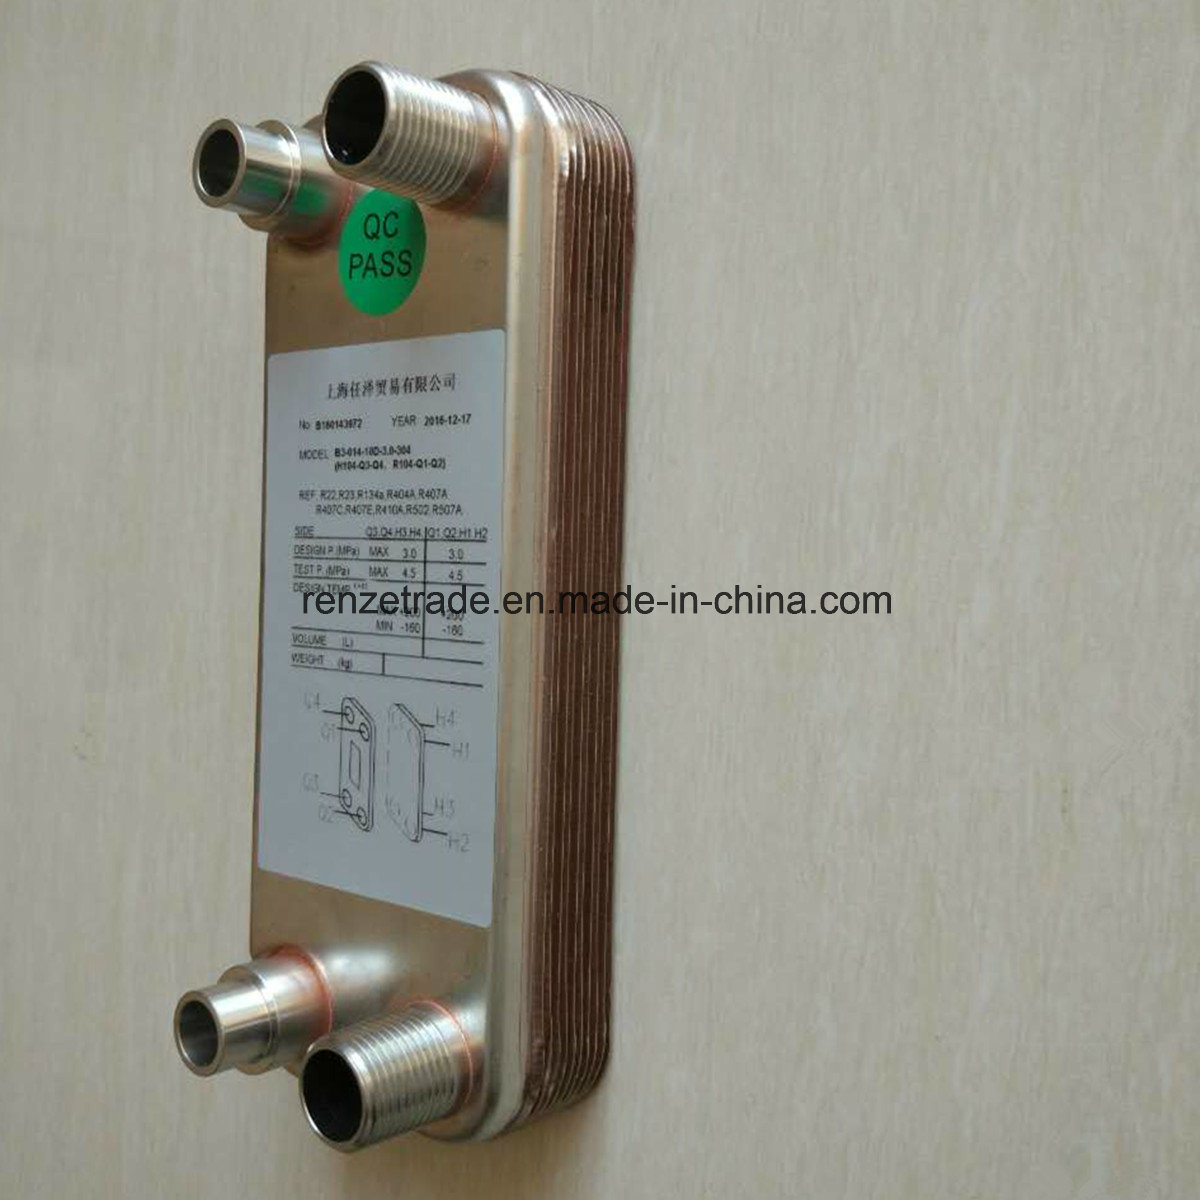 China Refrigerant to Water Copper Brazed Type Heat Exchanger